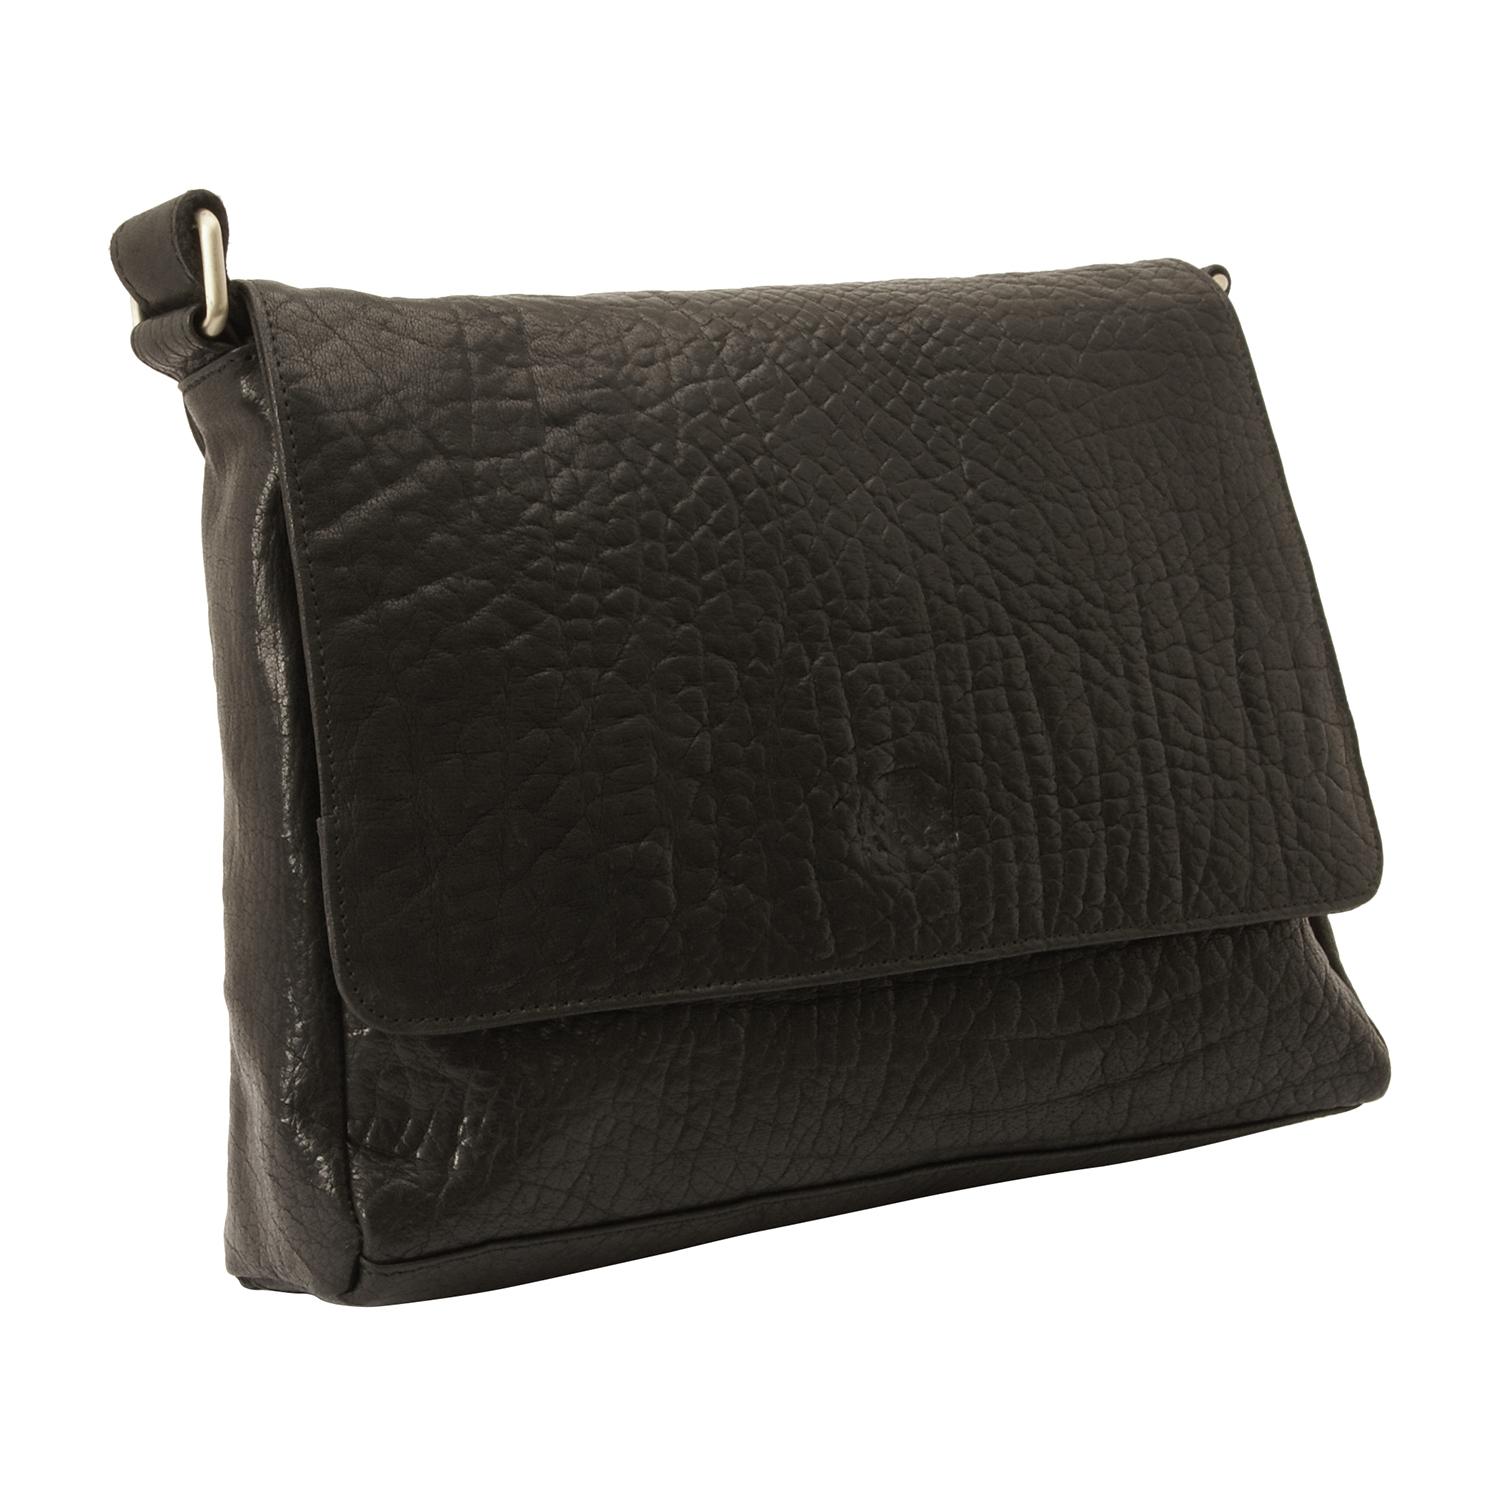 Rowallan – Black Veneer East/West Front Flap Messenger Bag in Buffalo Leather